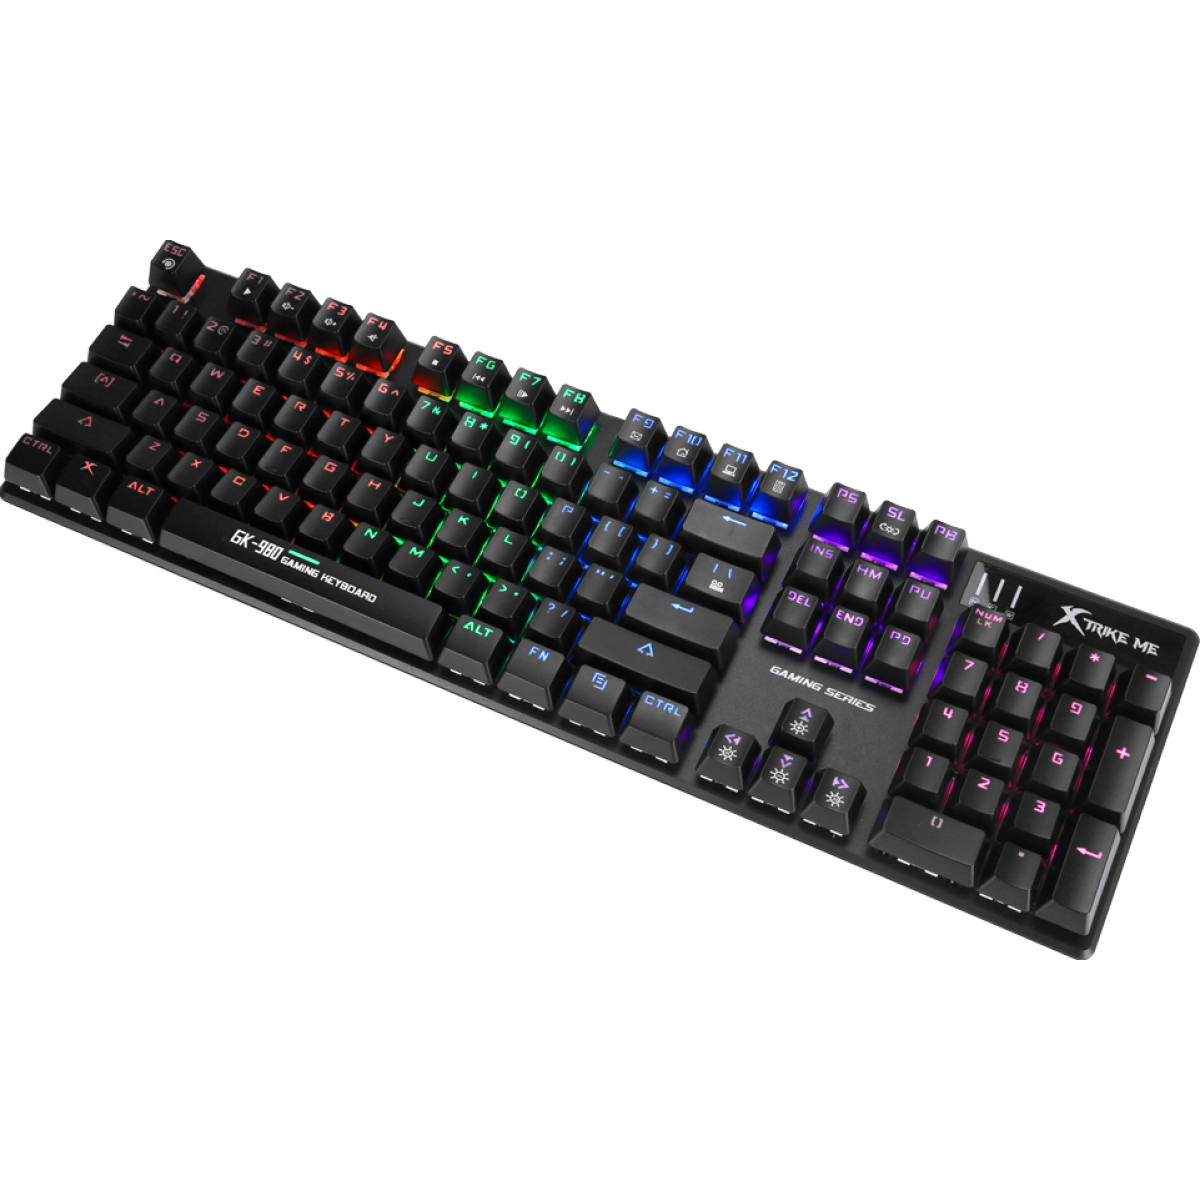 Teclado Mecânico Gamer Xtrike-Me GK-980, Rainbow, Switch Blue